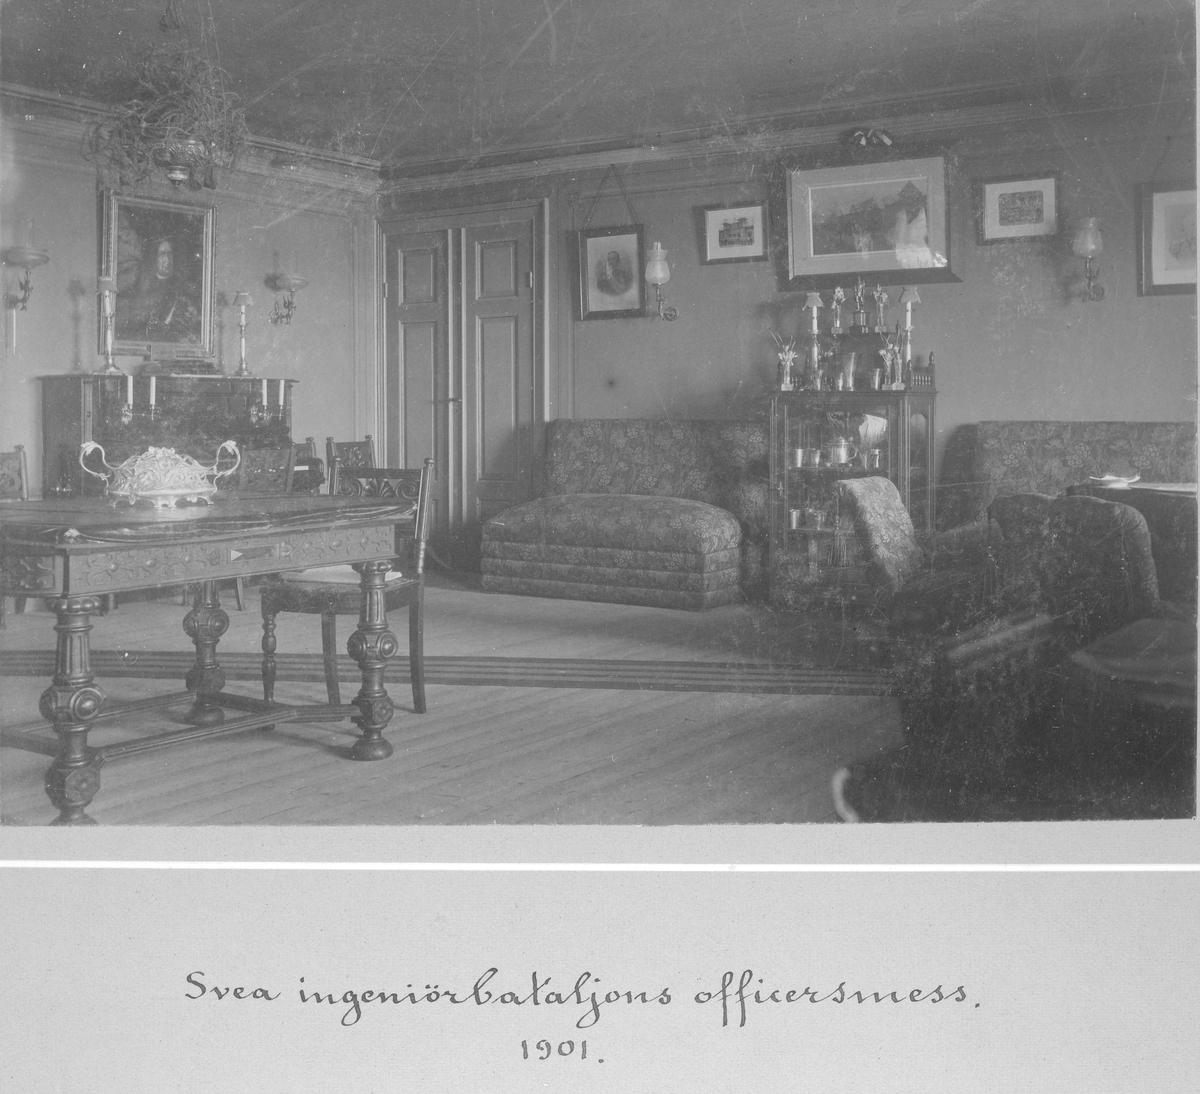 Svea ingenjörbataljon Ing 1 officersmäss 1901.